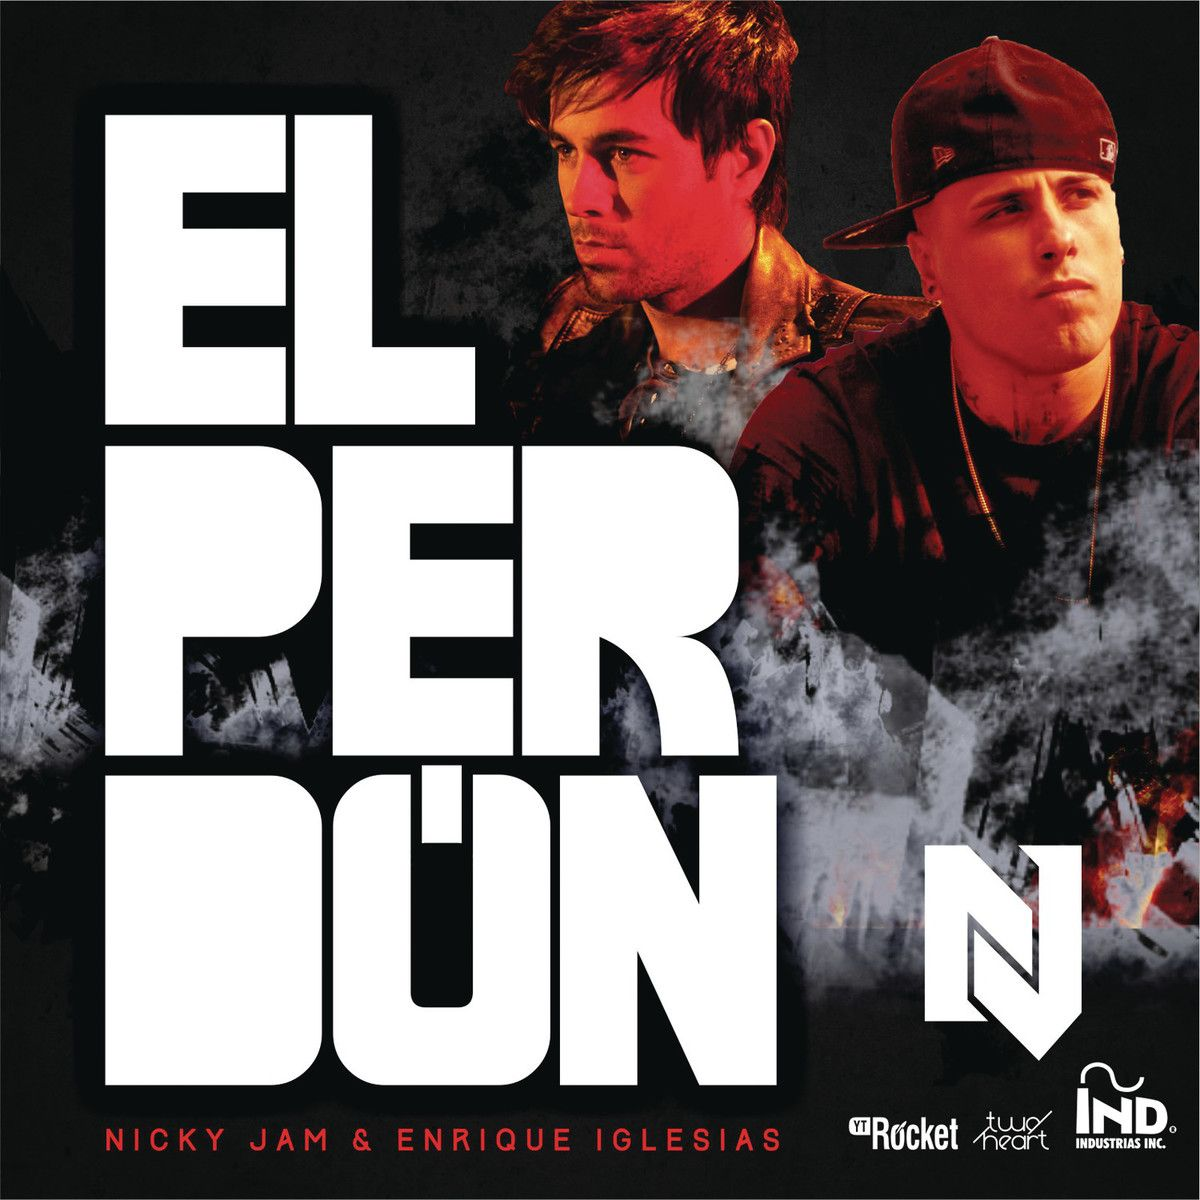 Nicky Jam Mp3 скачать бесплатно Enrique Iglesias Iglesias Songs